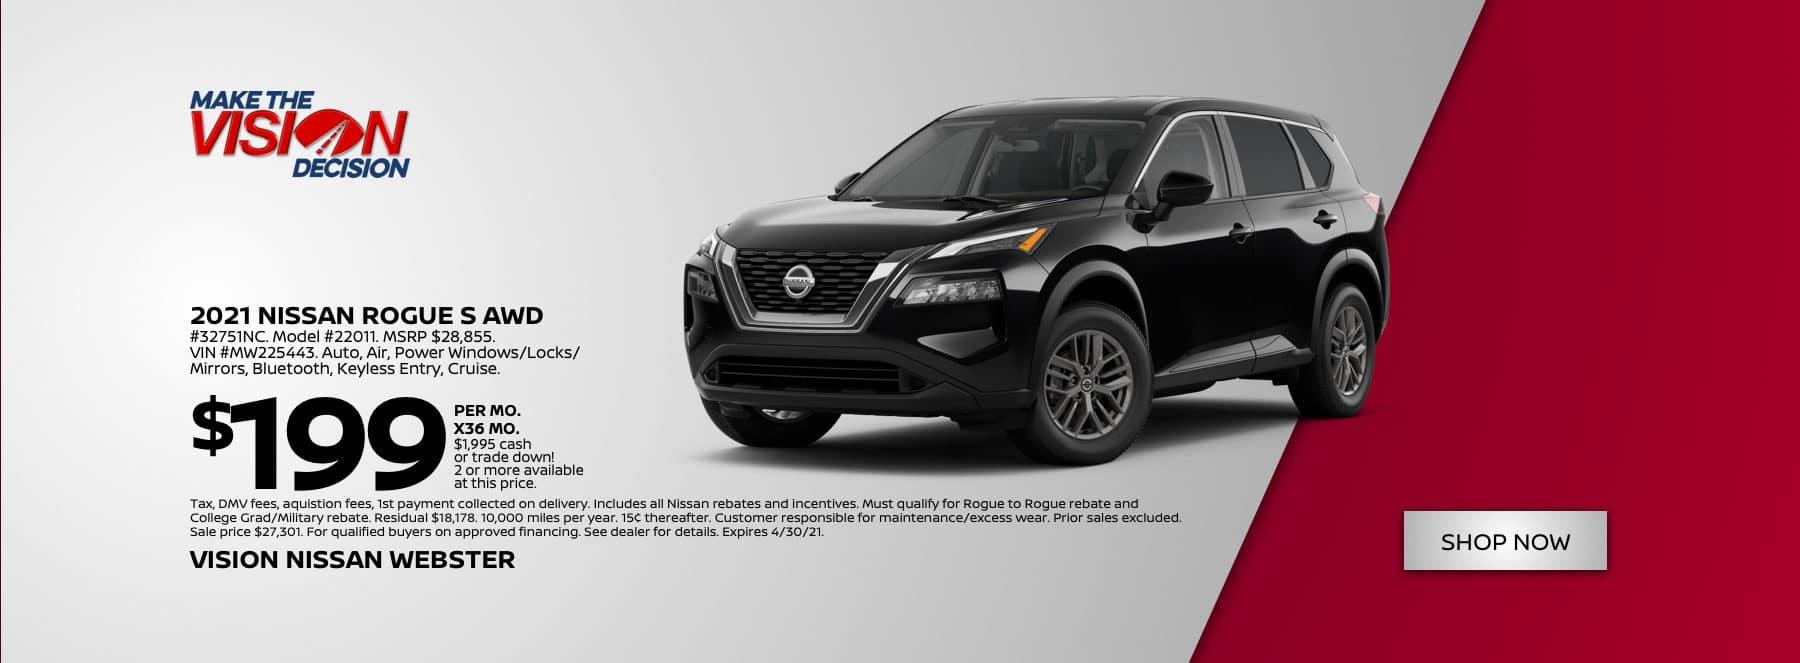 Vision-Nissan-Sliders-0305-Rogue-Web